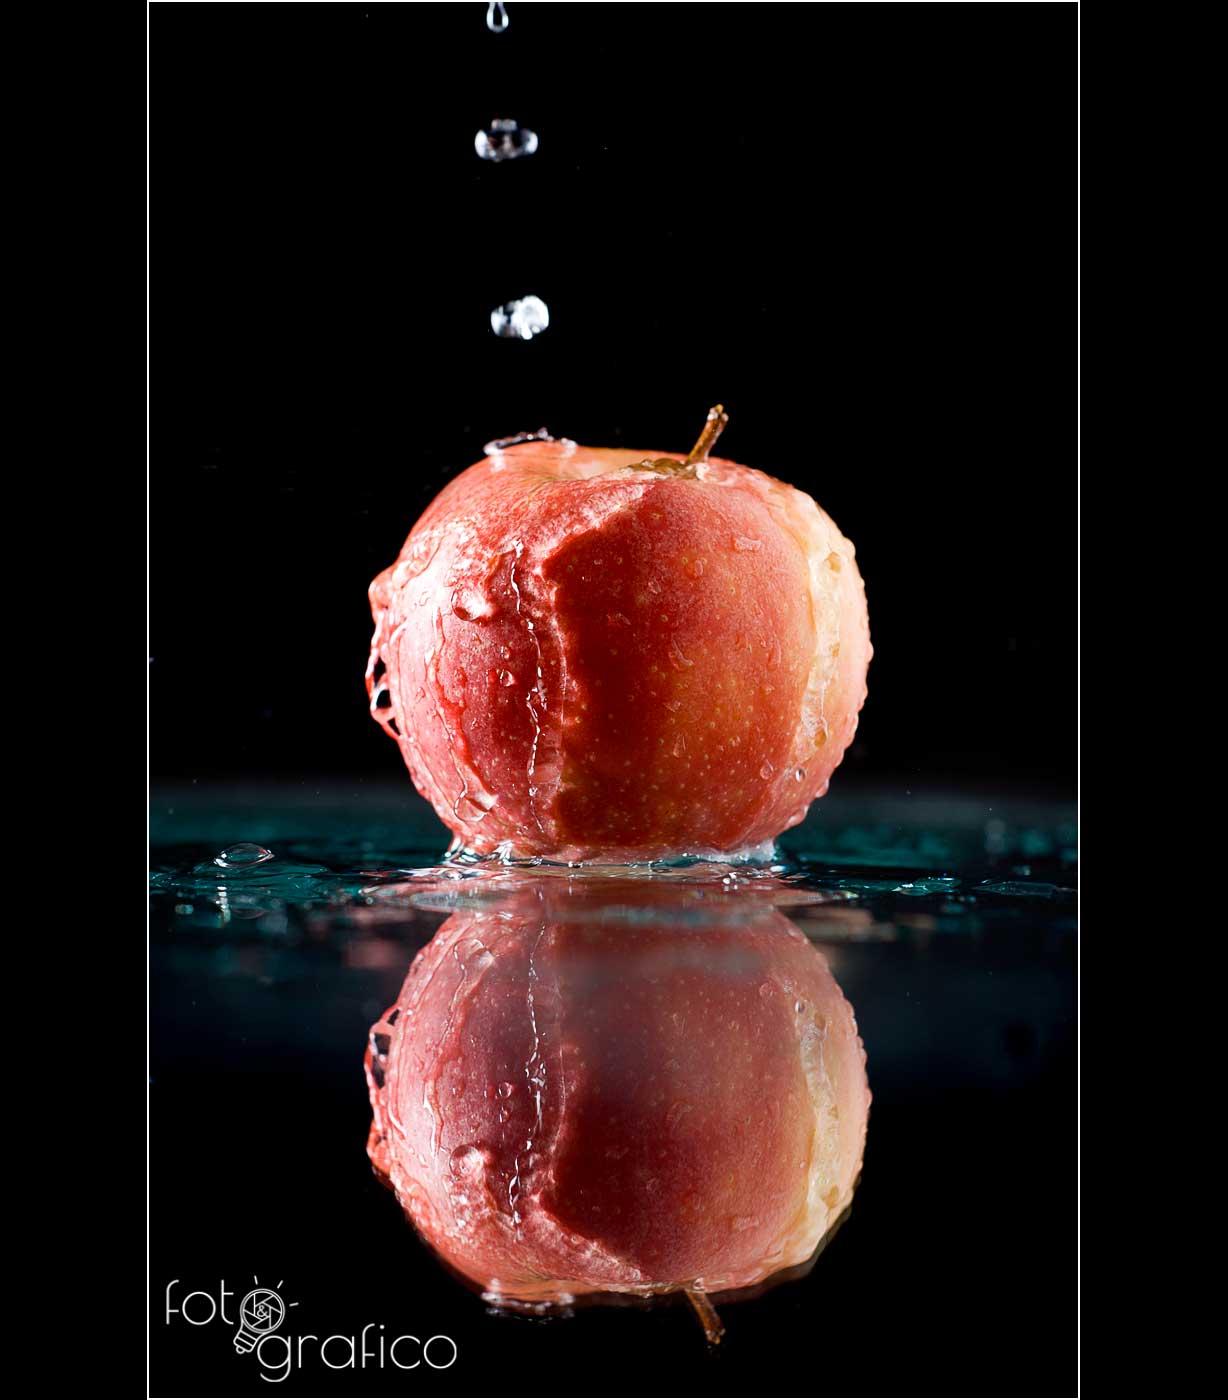 Still life photography advertising instragram angelo nucera 27